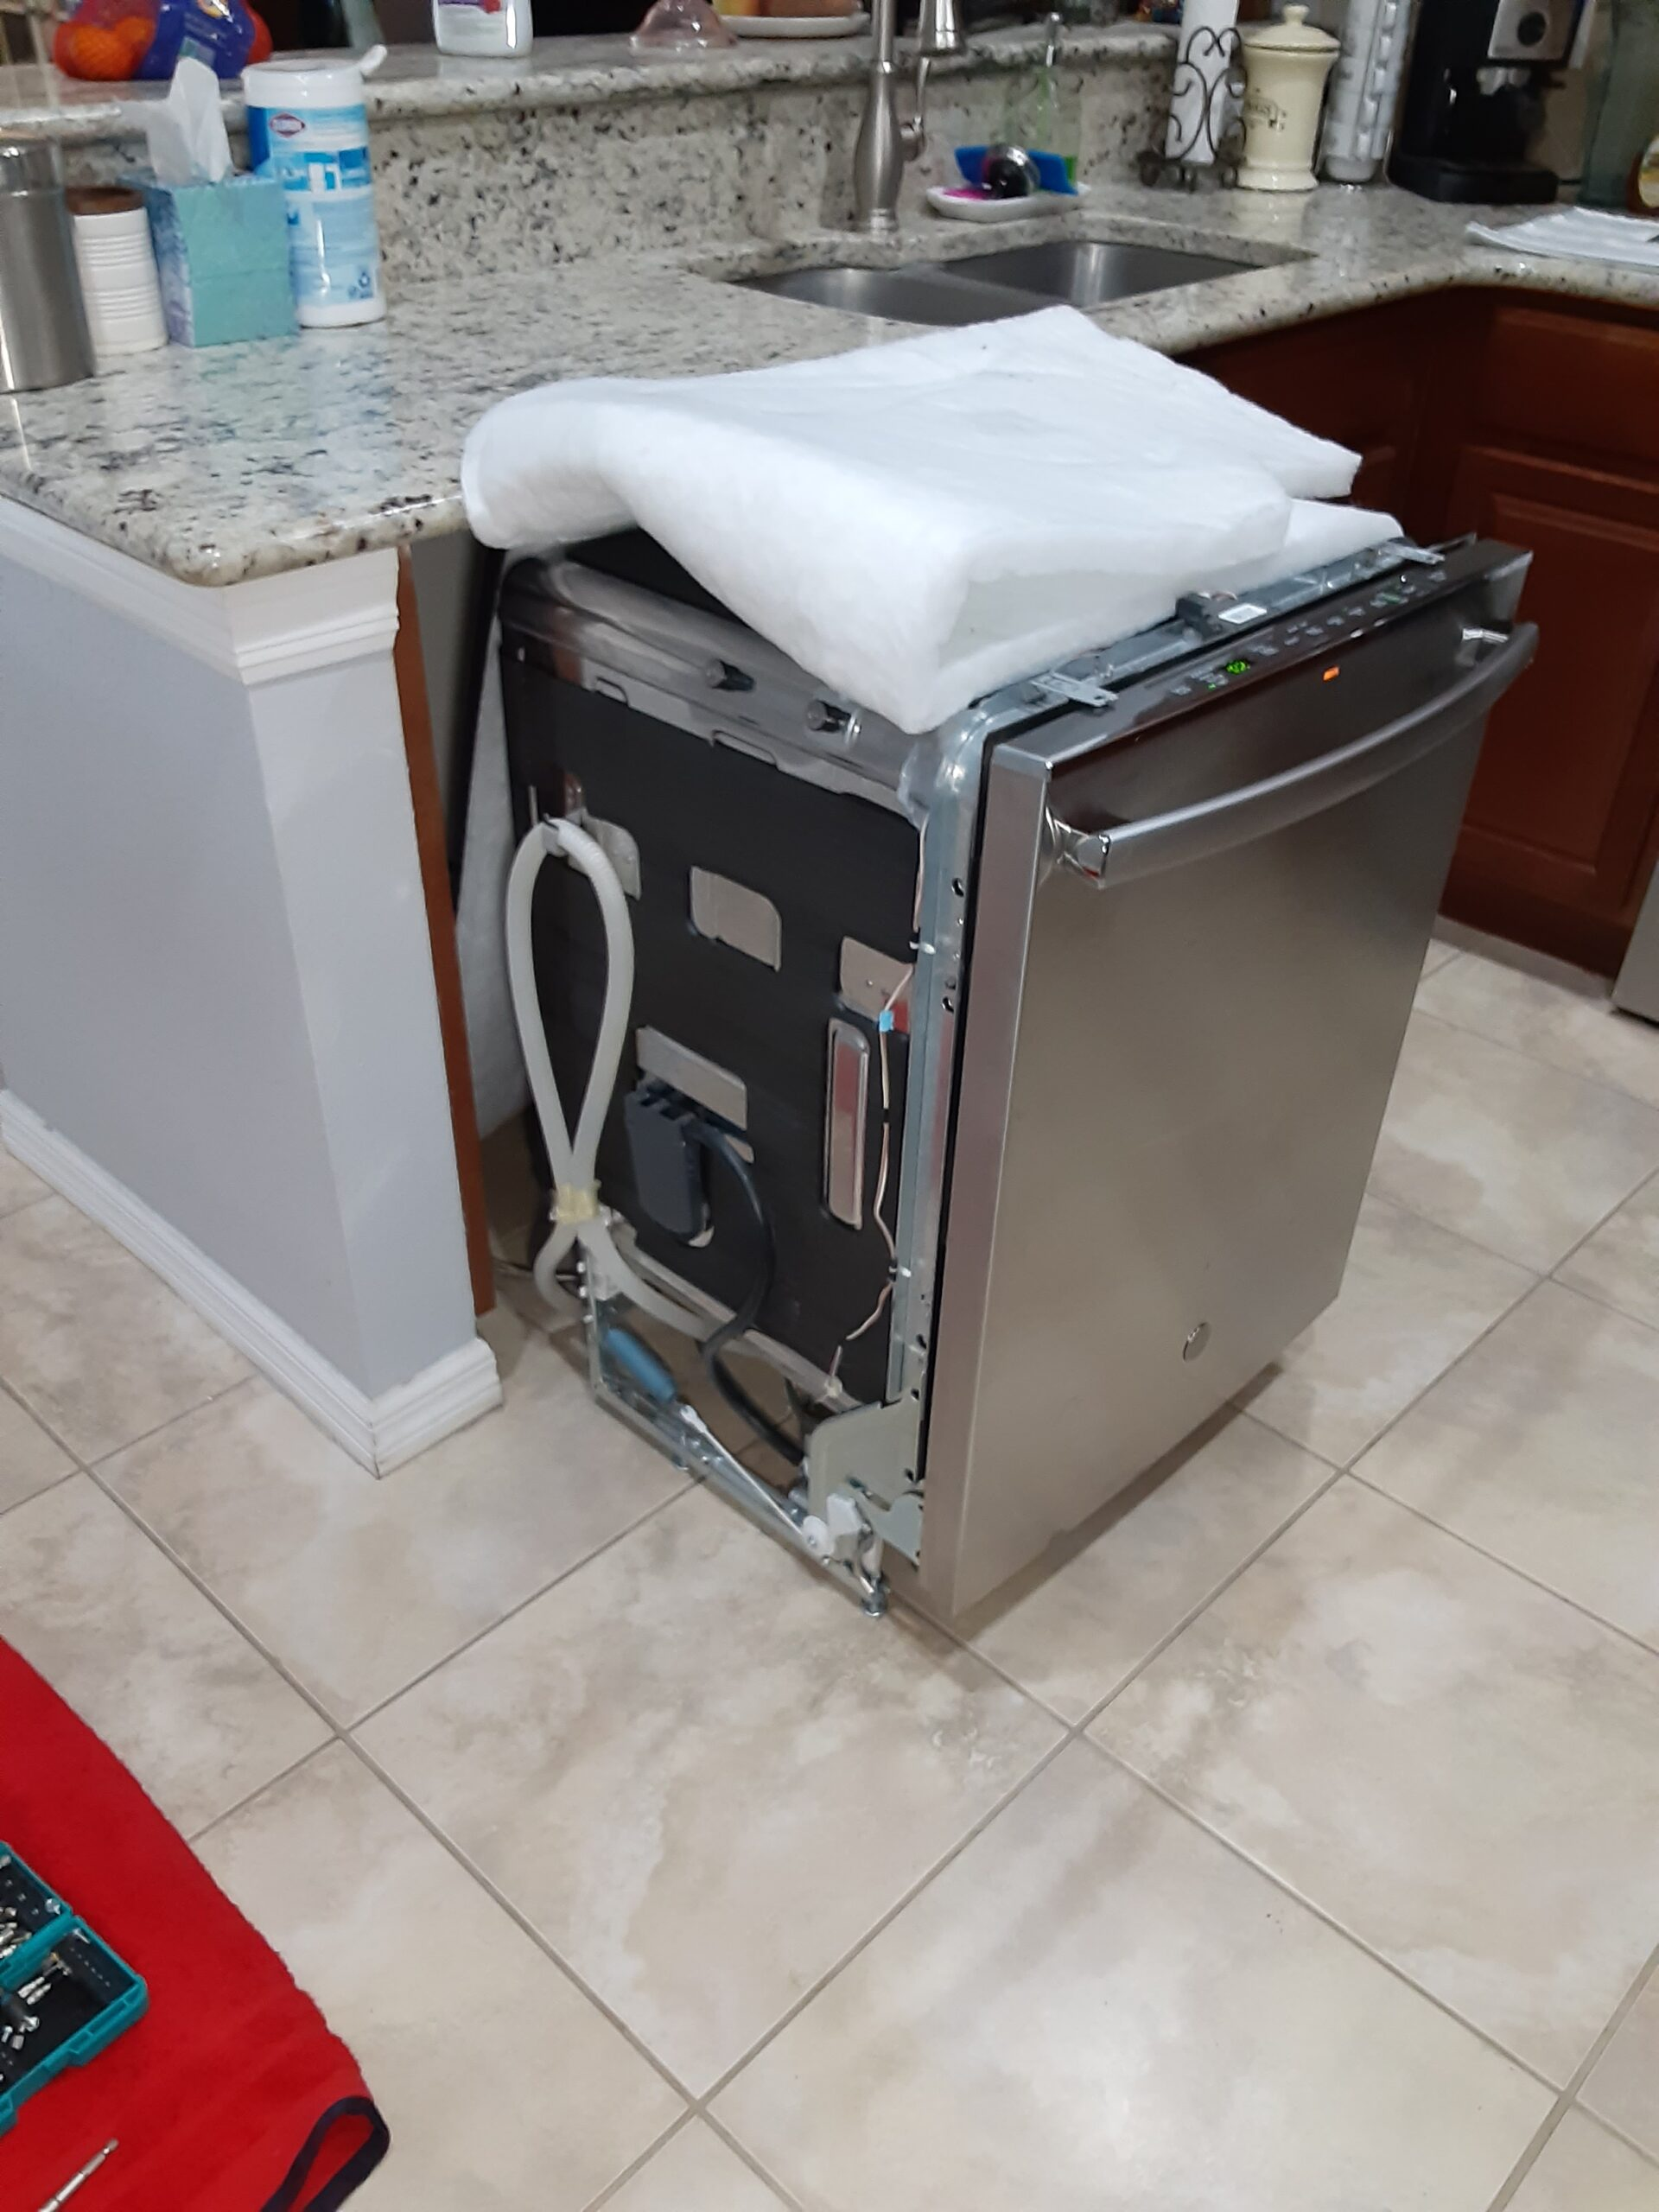 appliance repair dishwasher repair leaking issue lake mary fl